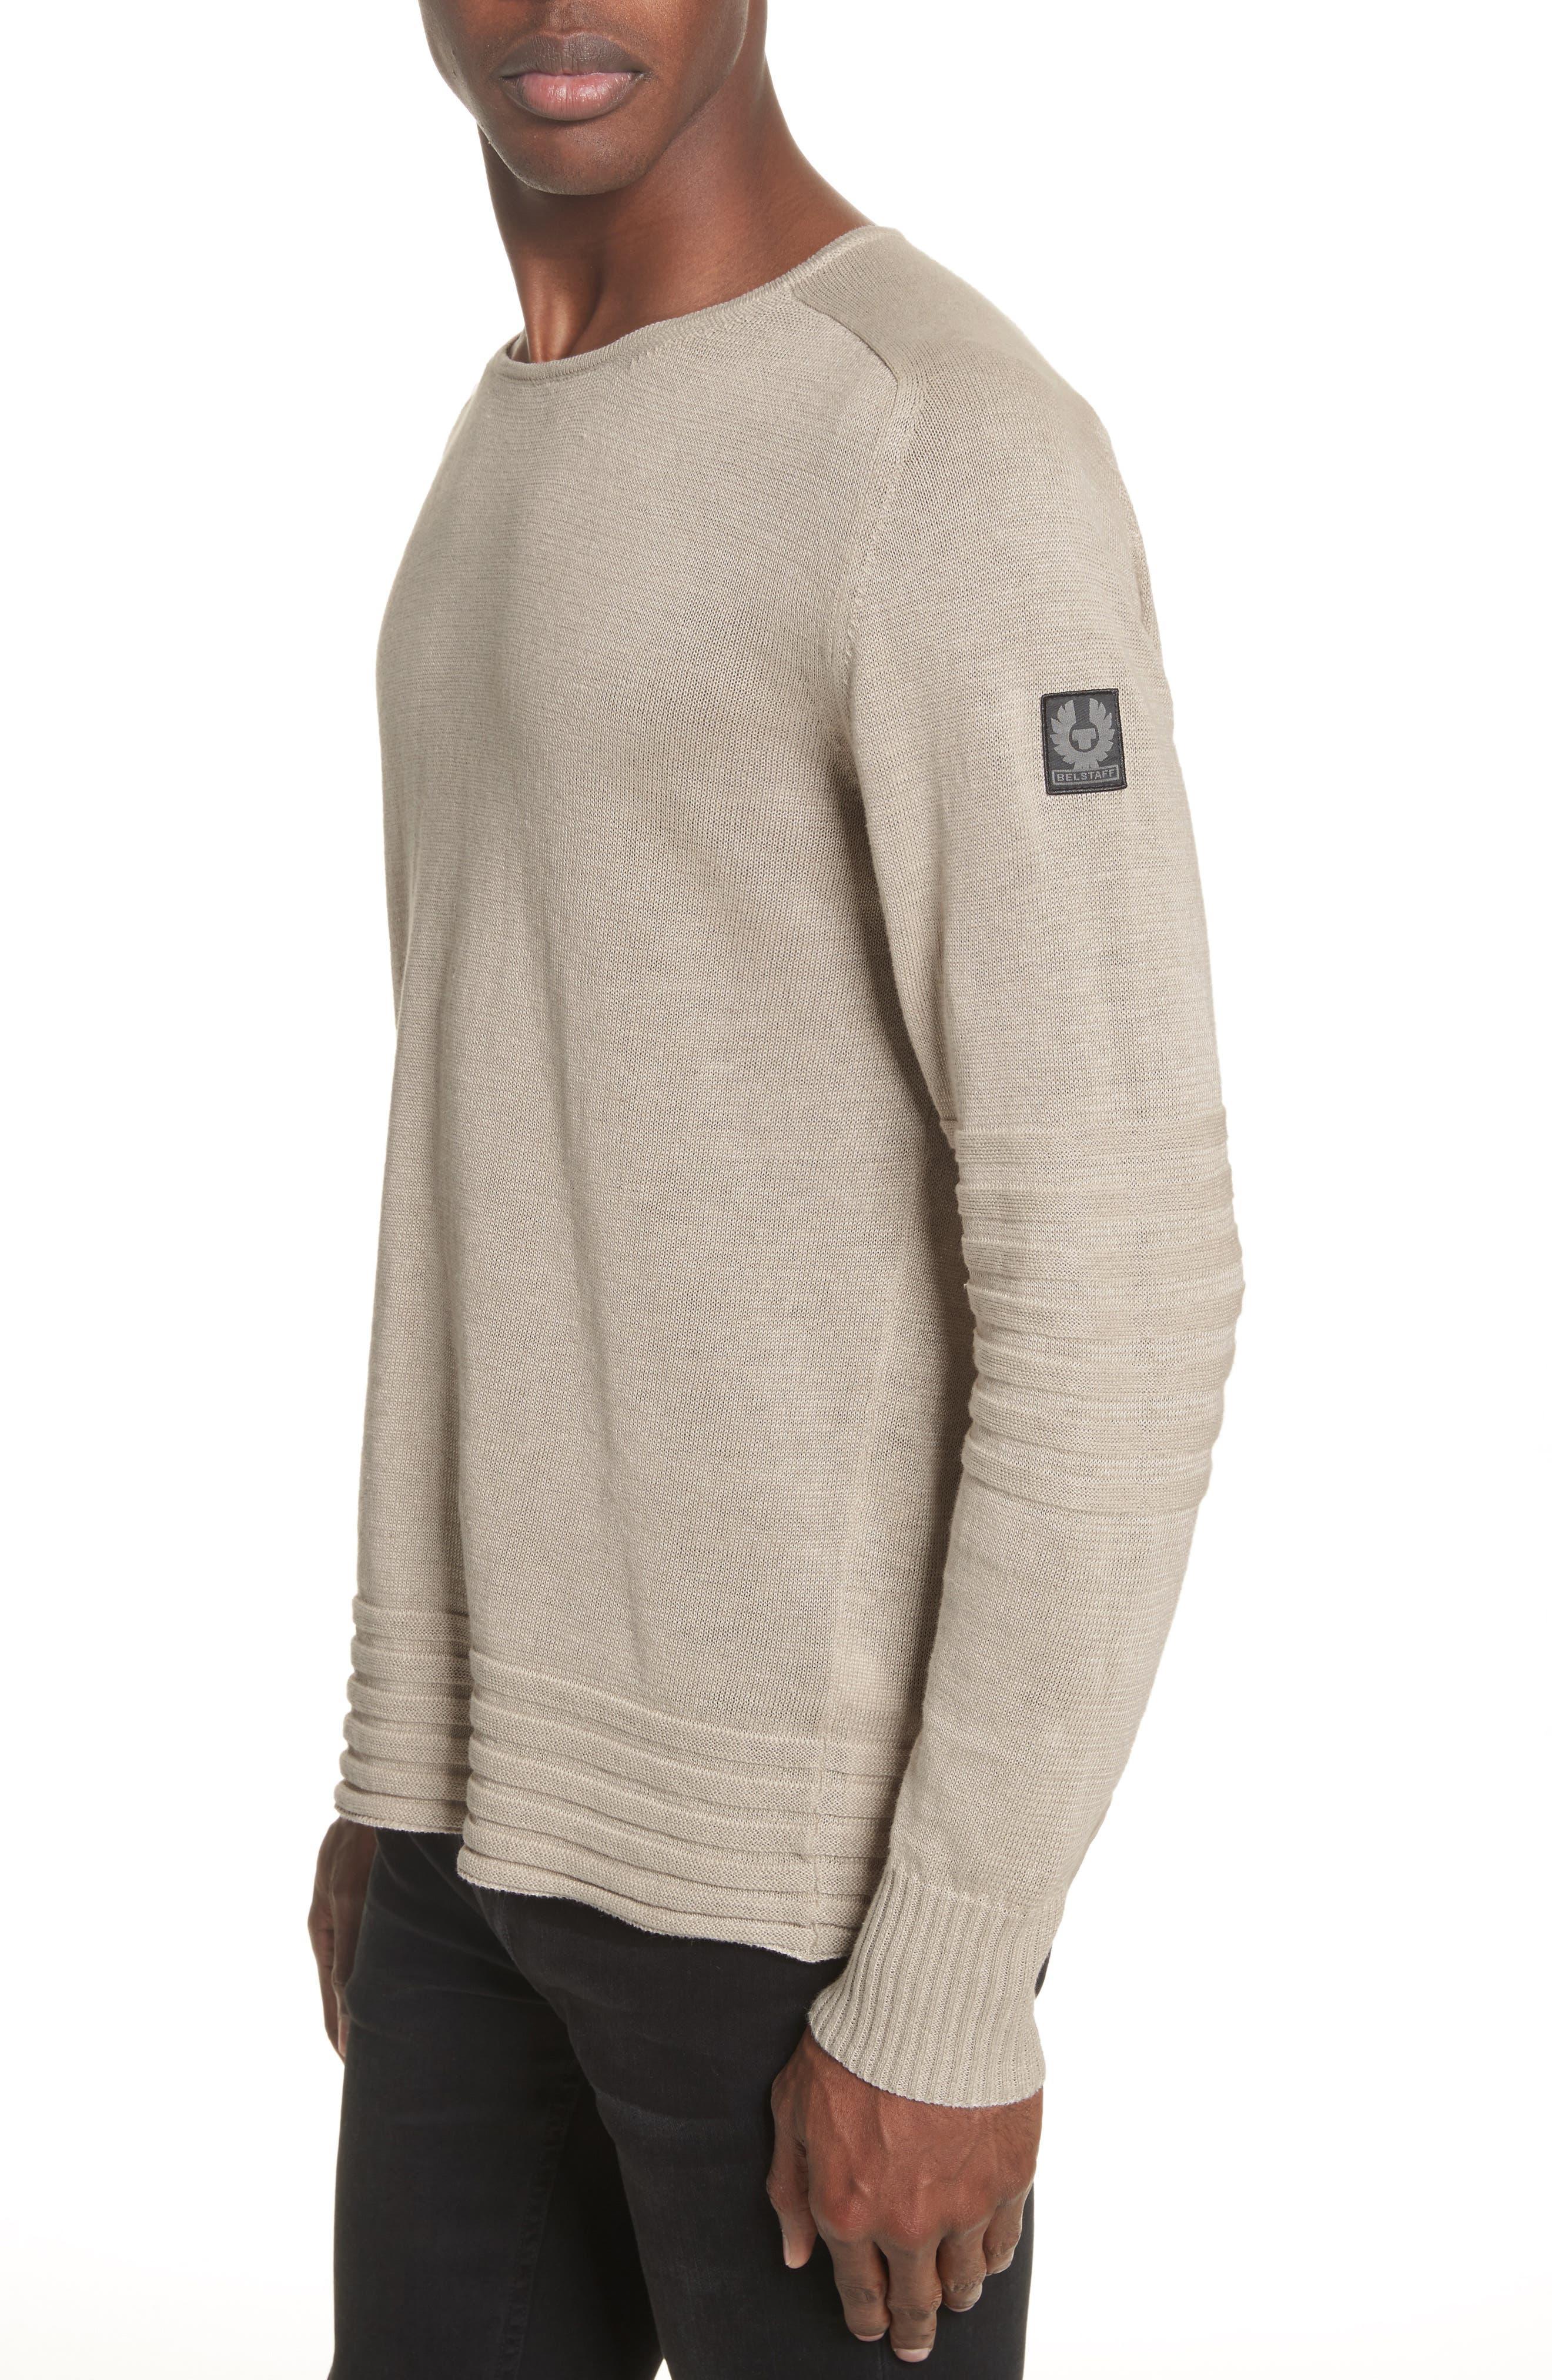 Exford Linen Crewneck Sweater,                         Main,                         color,